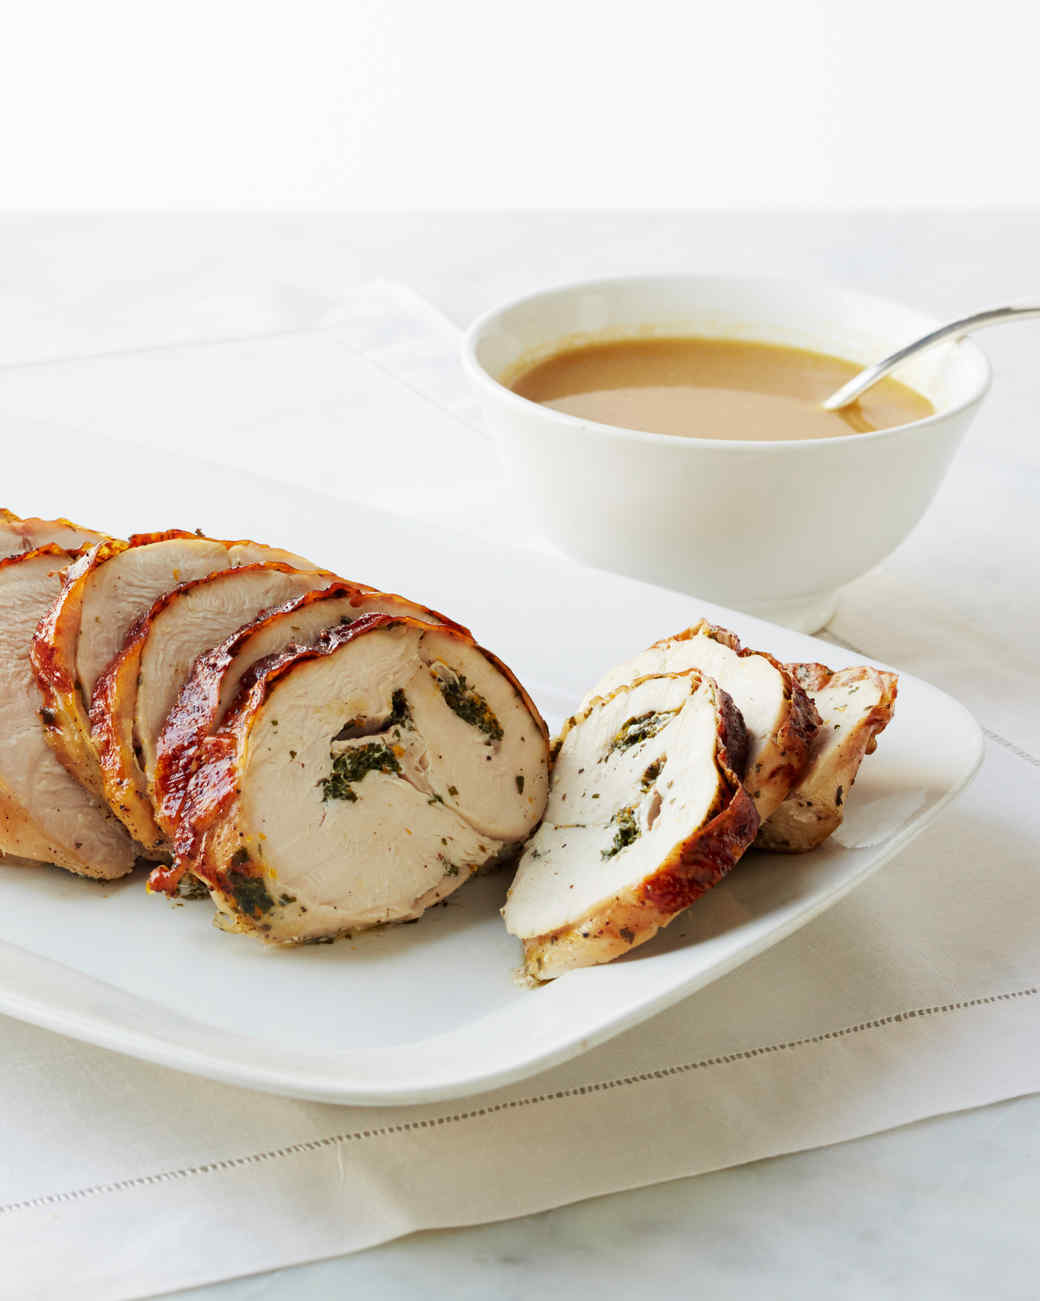 roasted-turkey-breast-with-herbs-023-d111289.jpg